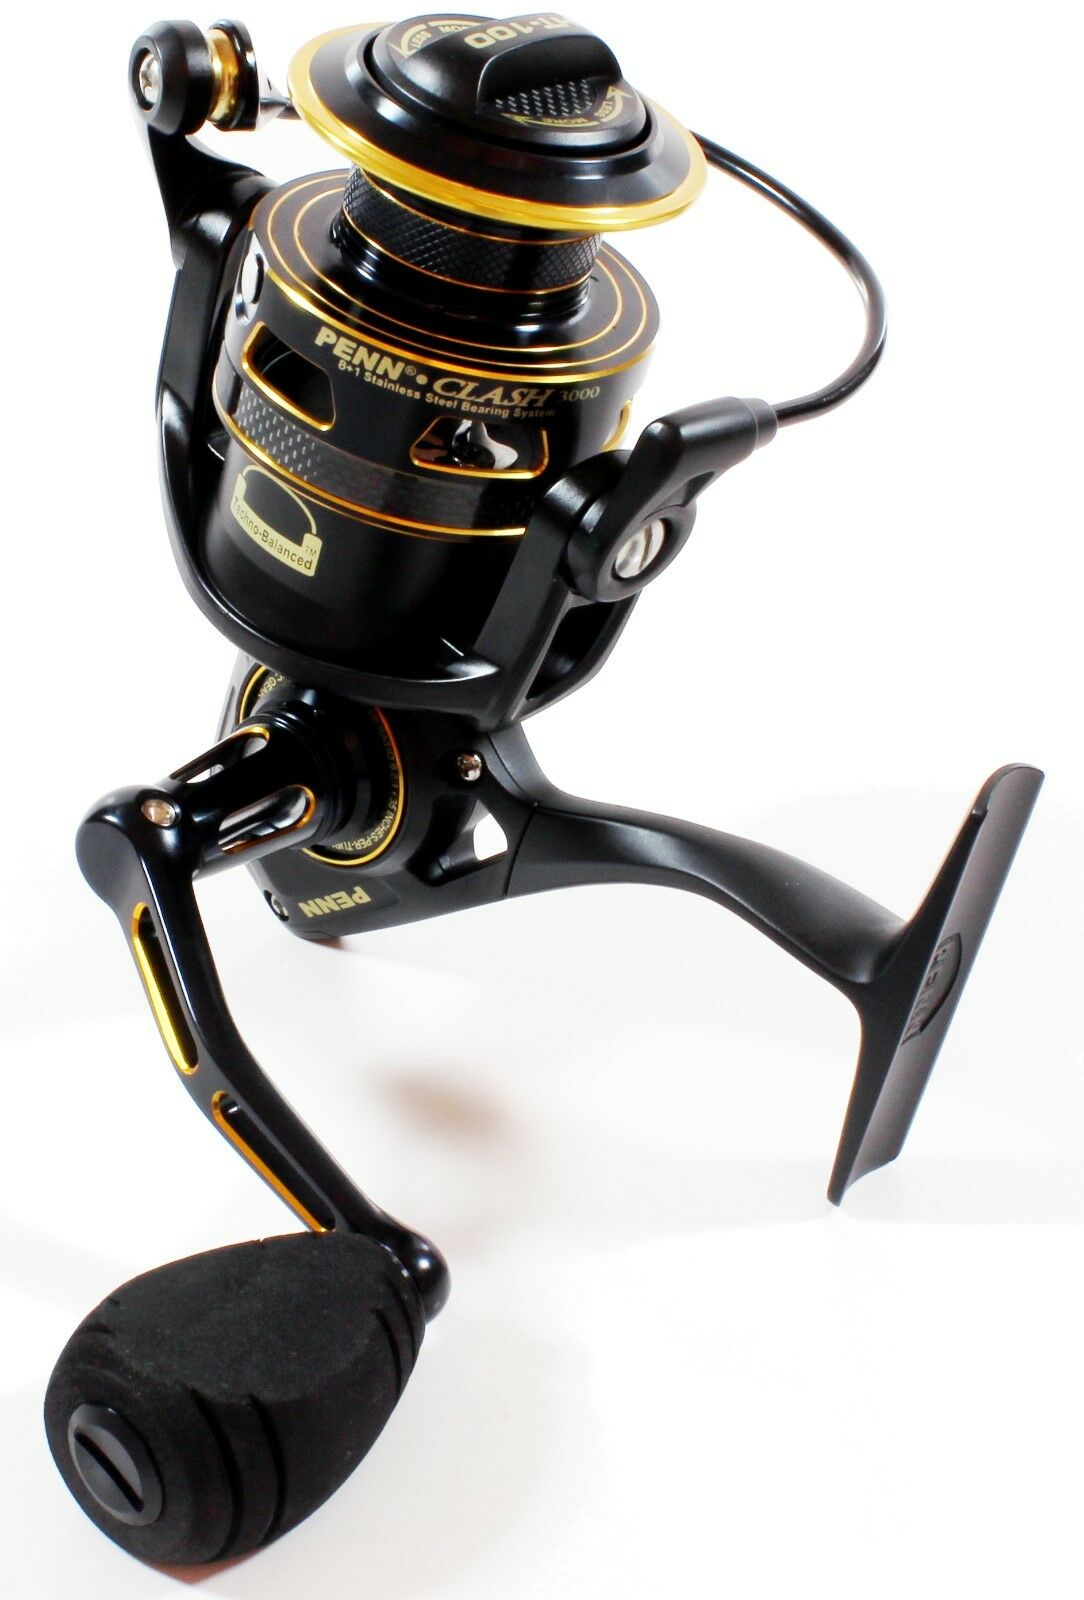 Penn clash 3000//fishing reel//1366180